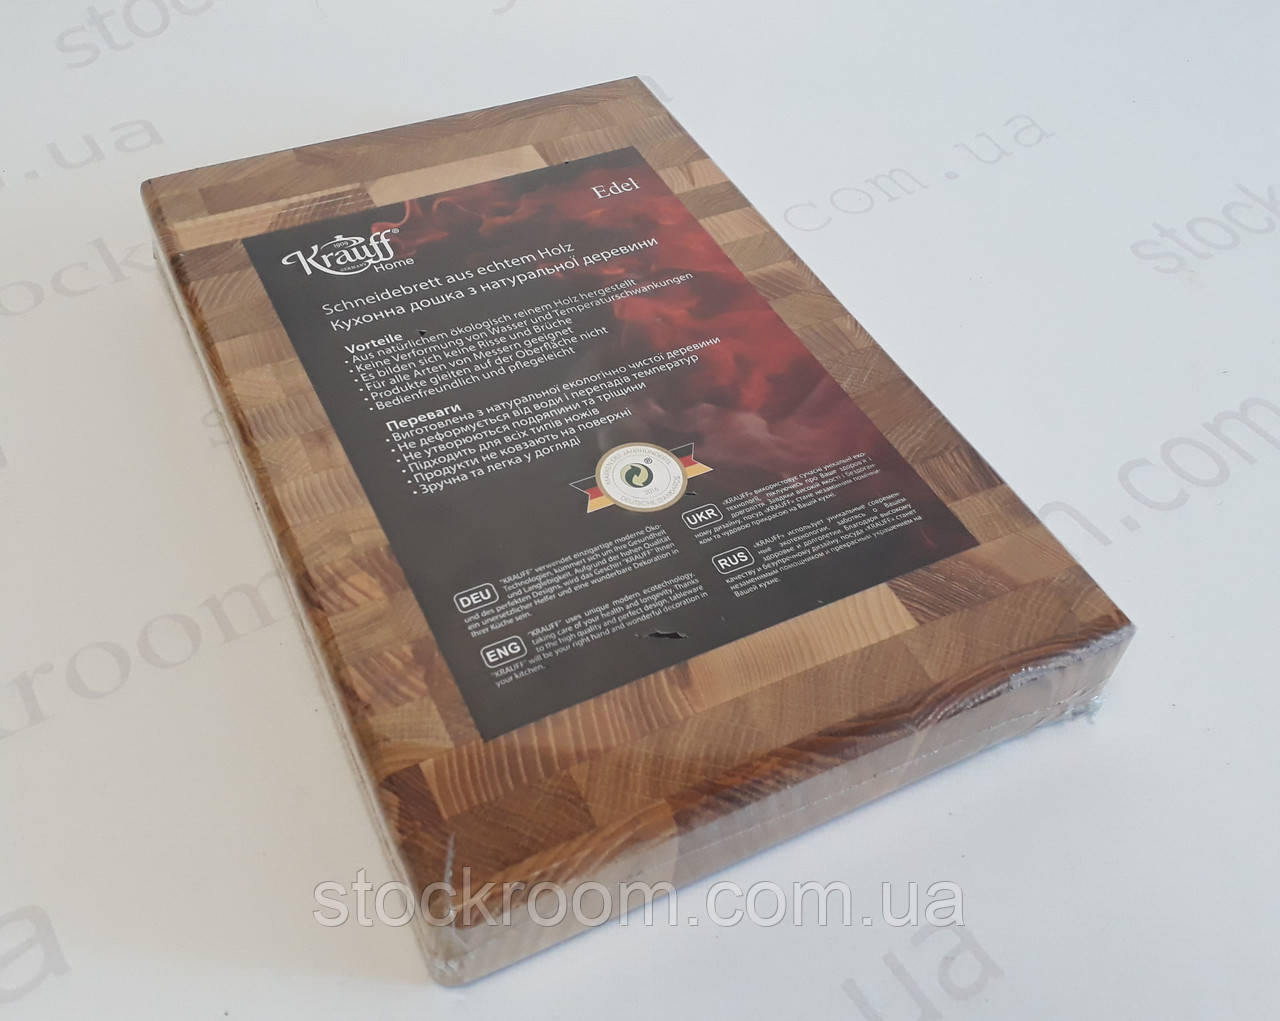 Доска разделочная Krauff 29-161-005 деревянная